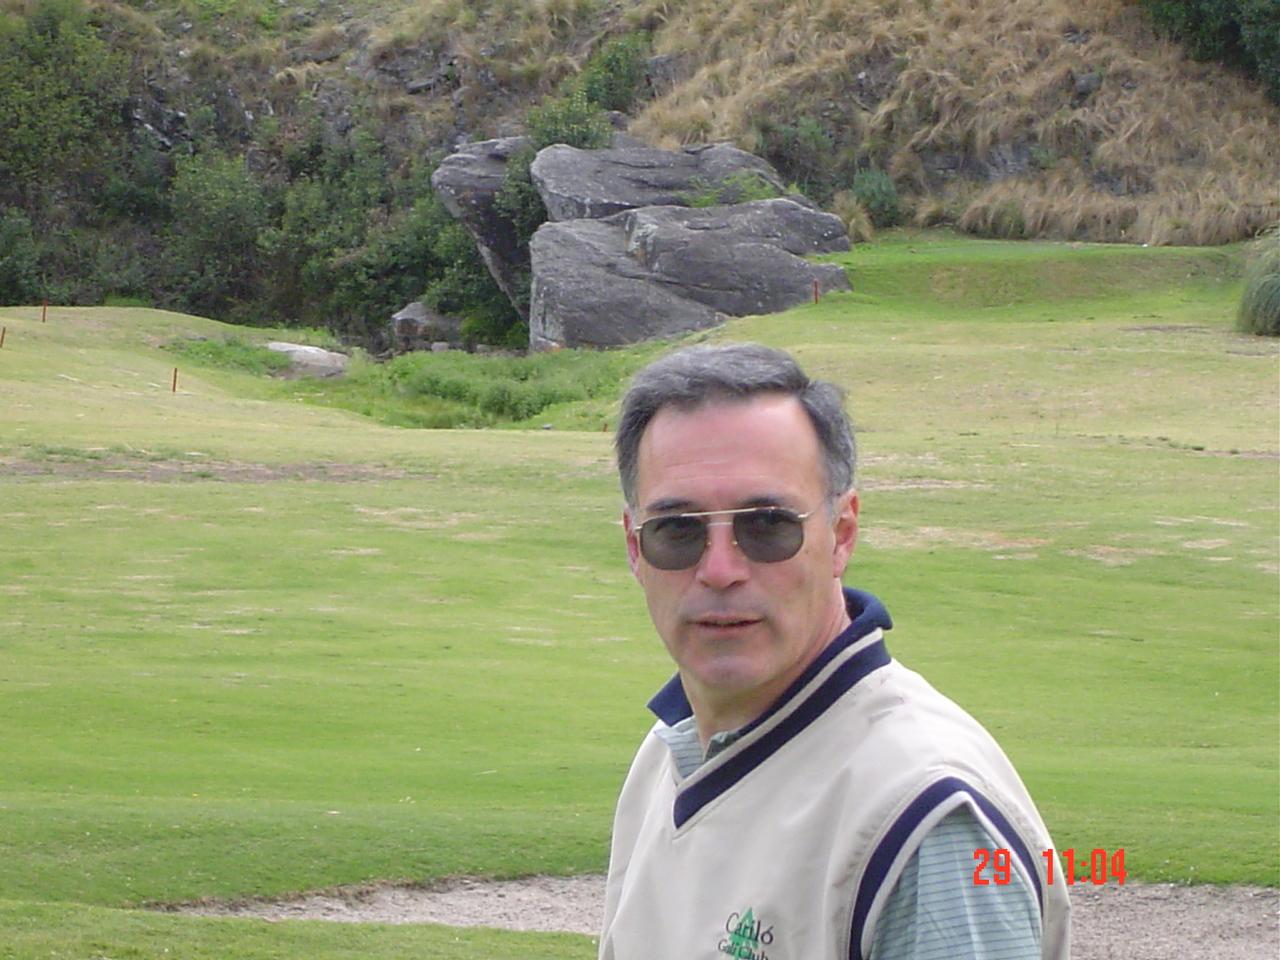 http://3.bp.blogspot.com/-EAoPZcRgFH0/TKpRjENUrrI/AAAAAAAAAQM/lLkZsJoFD-I/s1600/Golf+Cordoba+2004+097.jpg